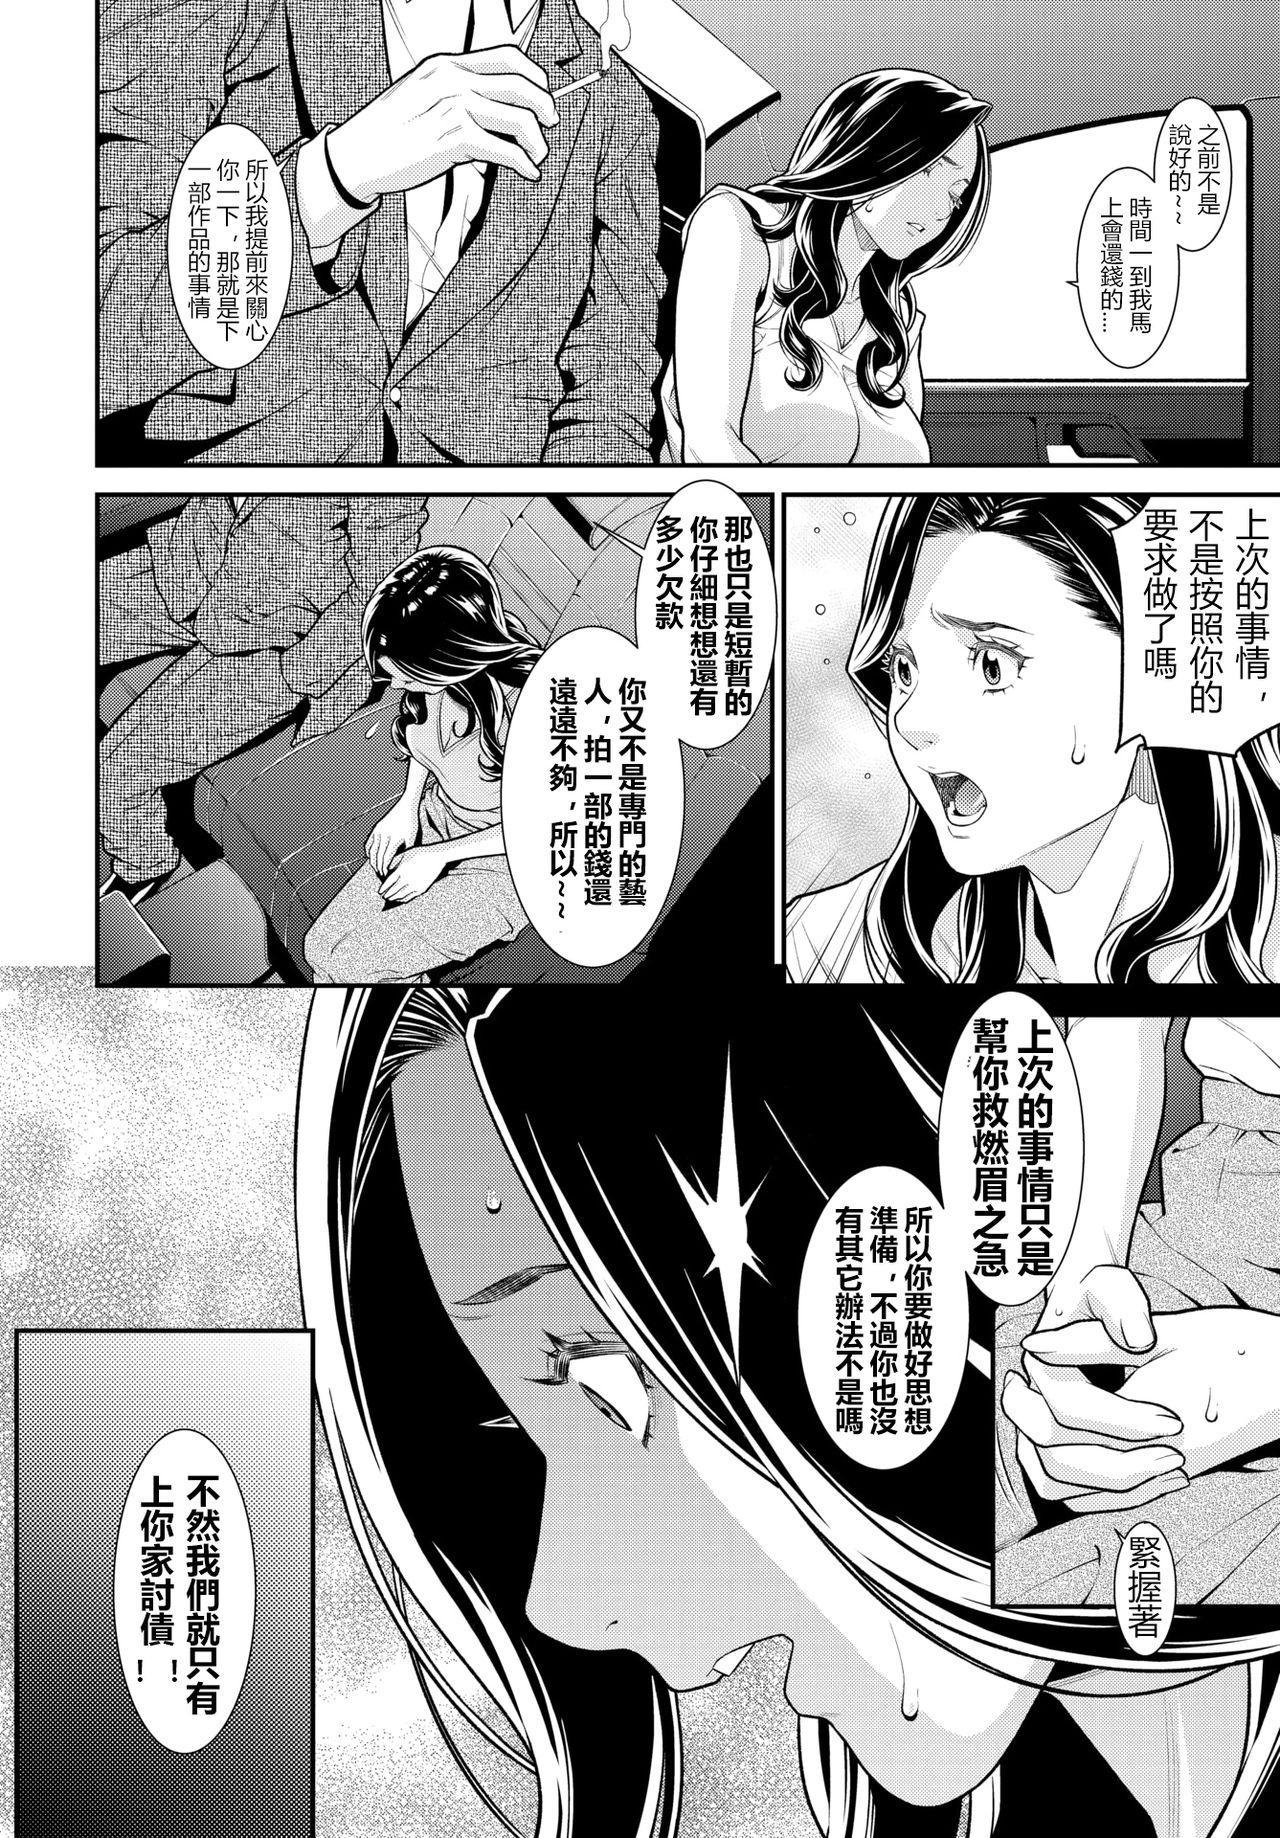 [Syuuen] Secret Wife  1-6 [Chinese][鼠灣漢化](210206最新修复完整版)【極品人妻NTR】 22